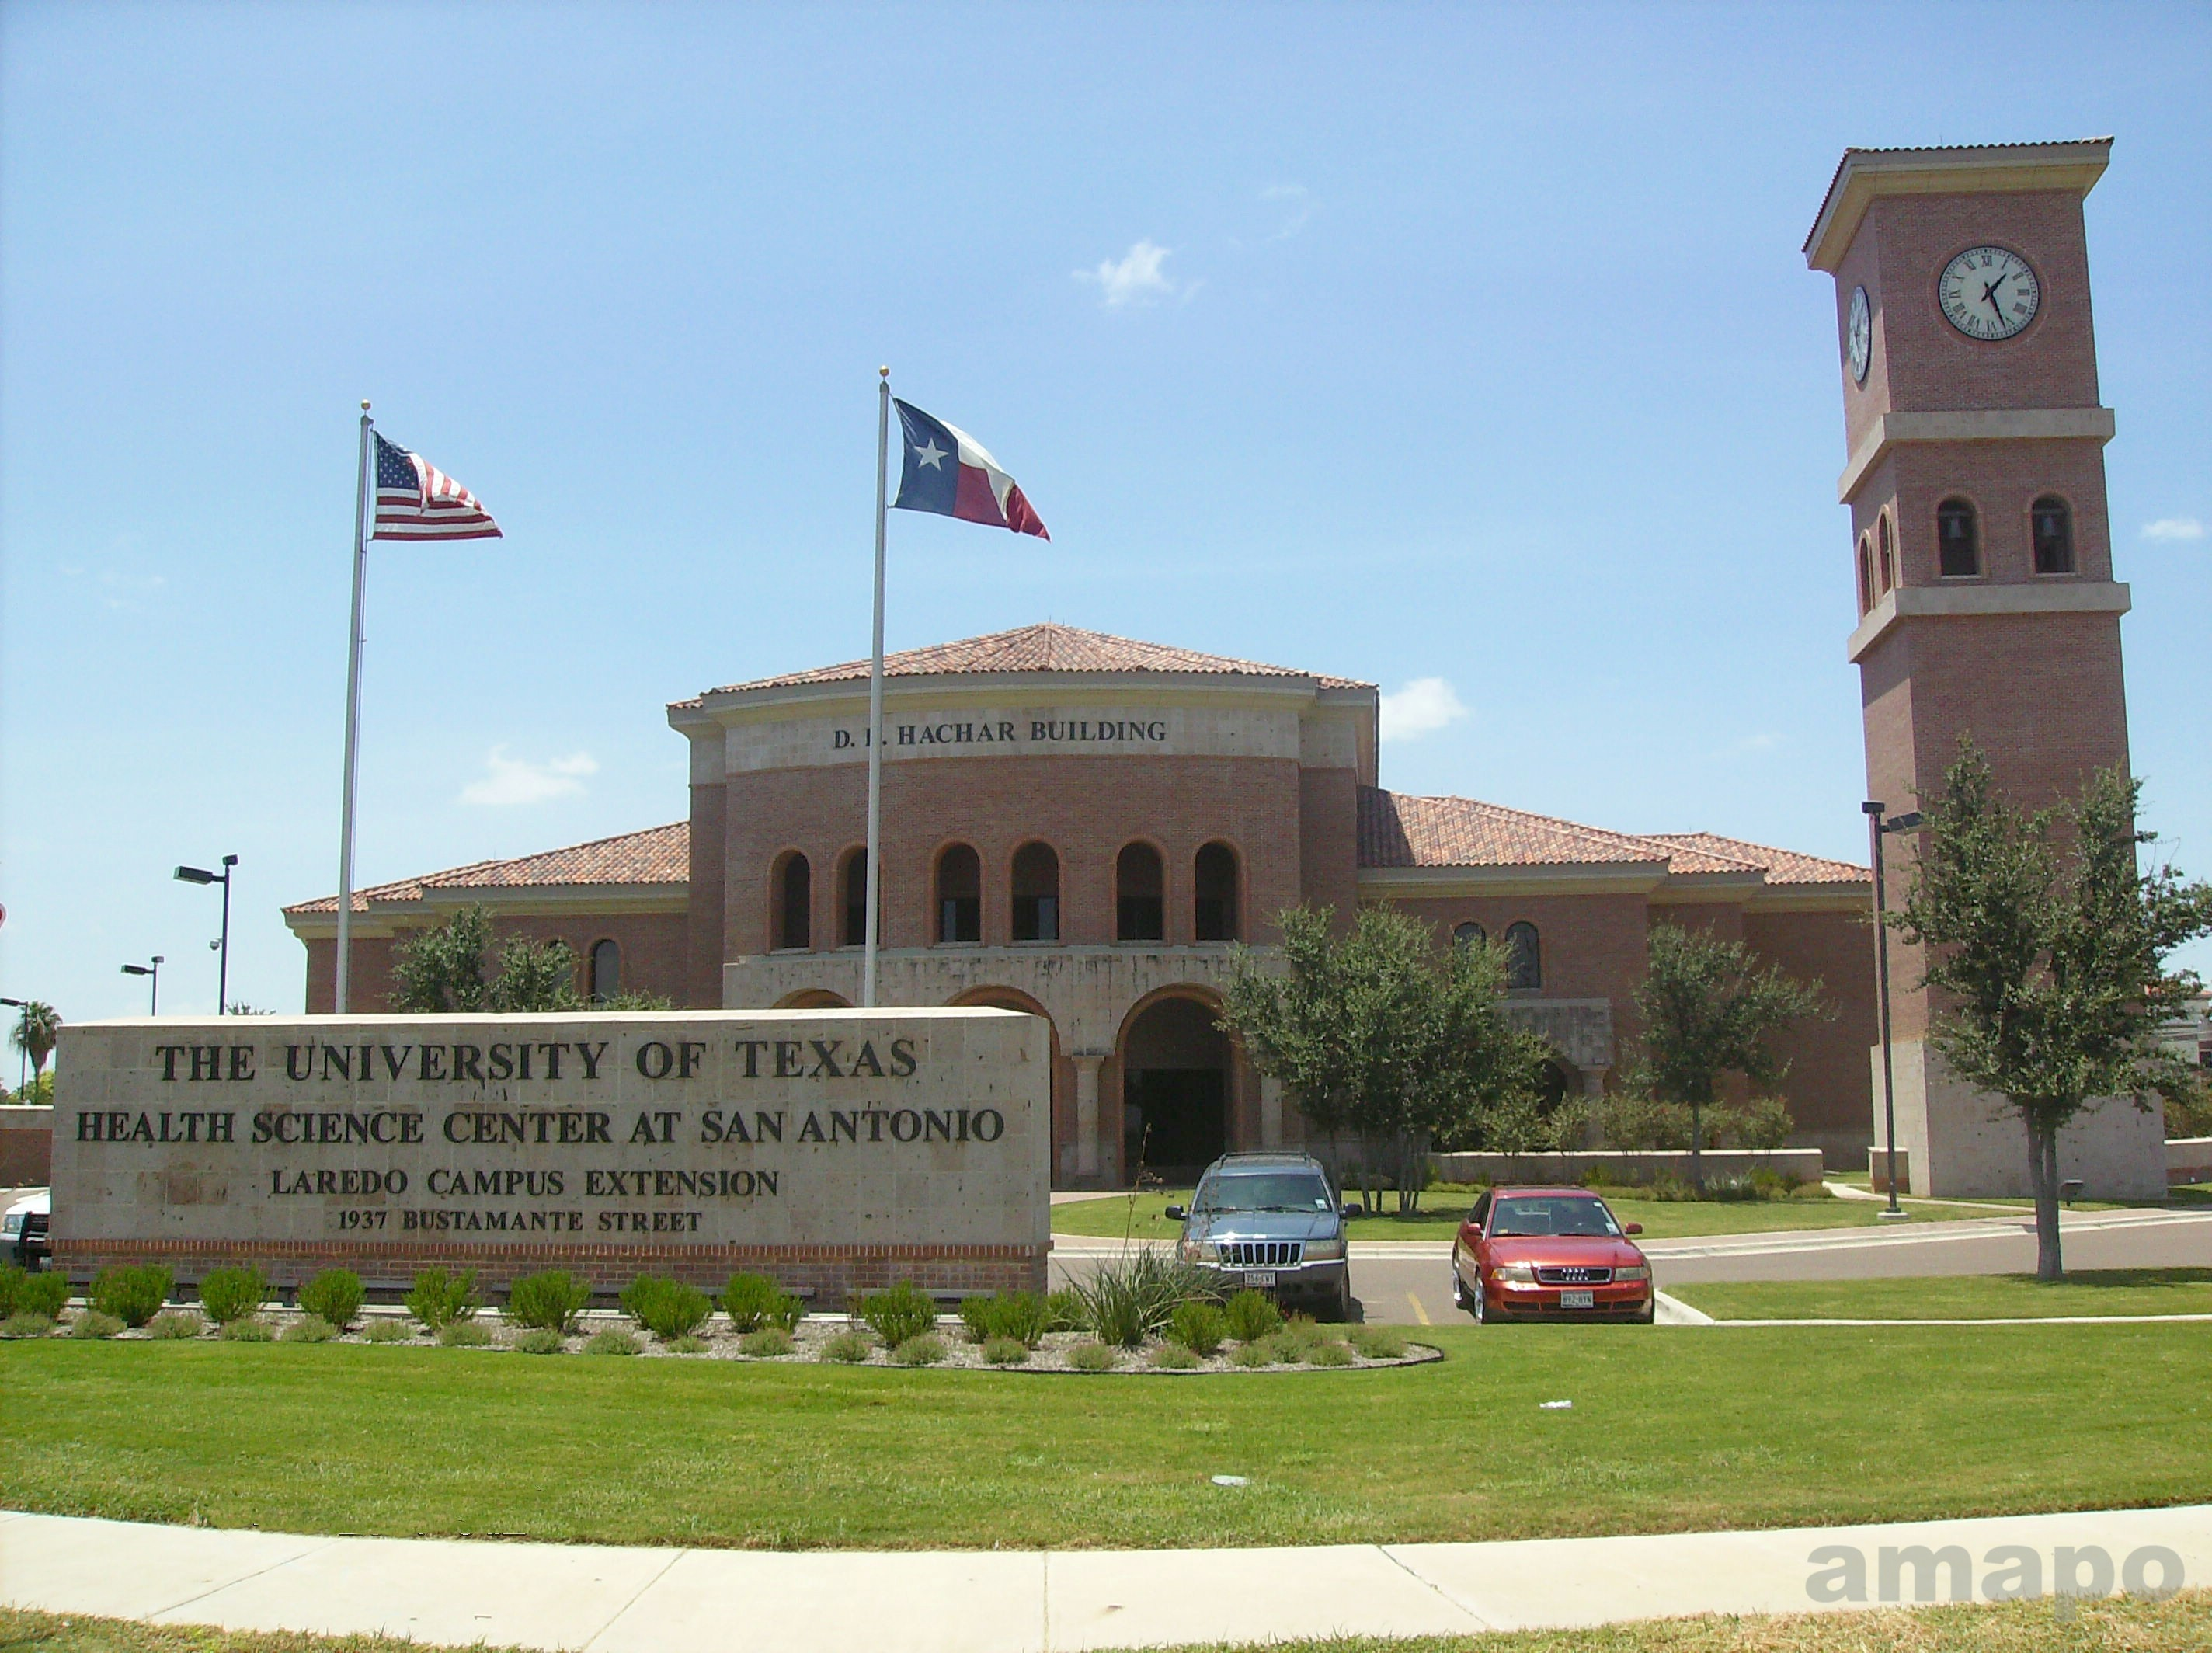 union college nebraska wikipedia autos post